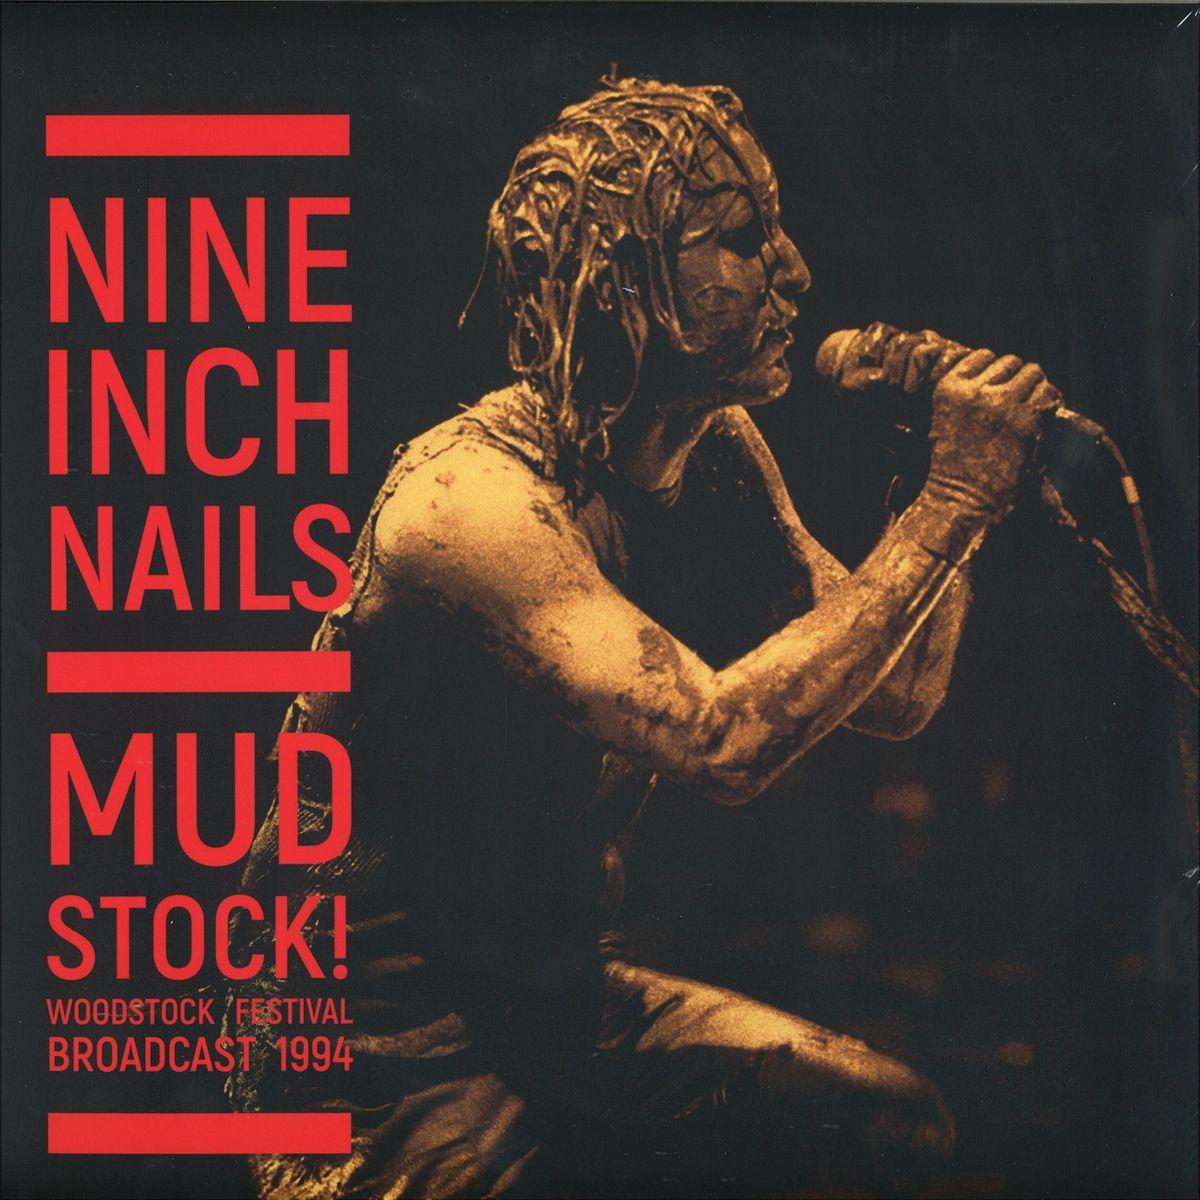 Nine Inch Nails - Mudstock! (woodstock 1994) / Parachute PARA124LP ...